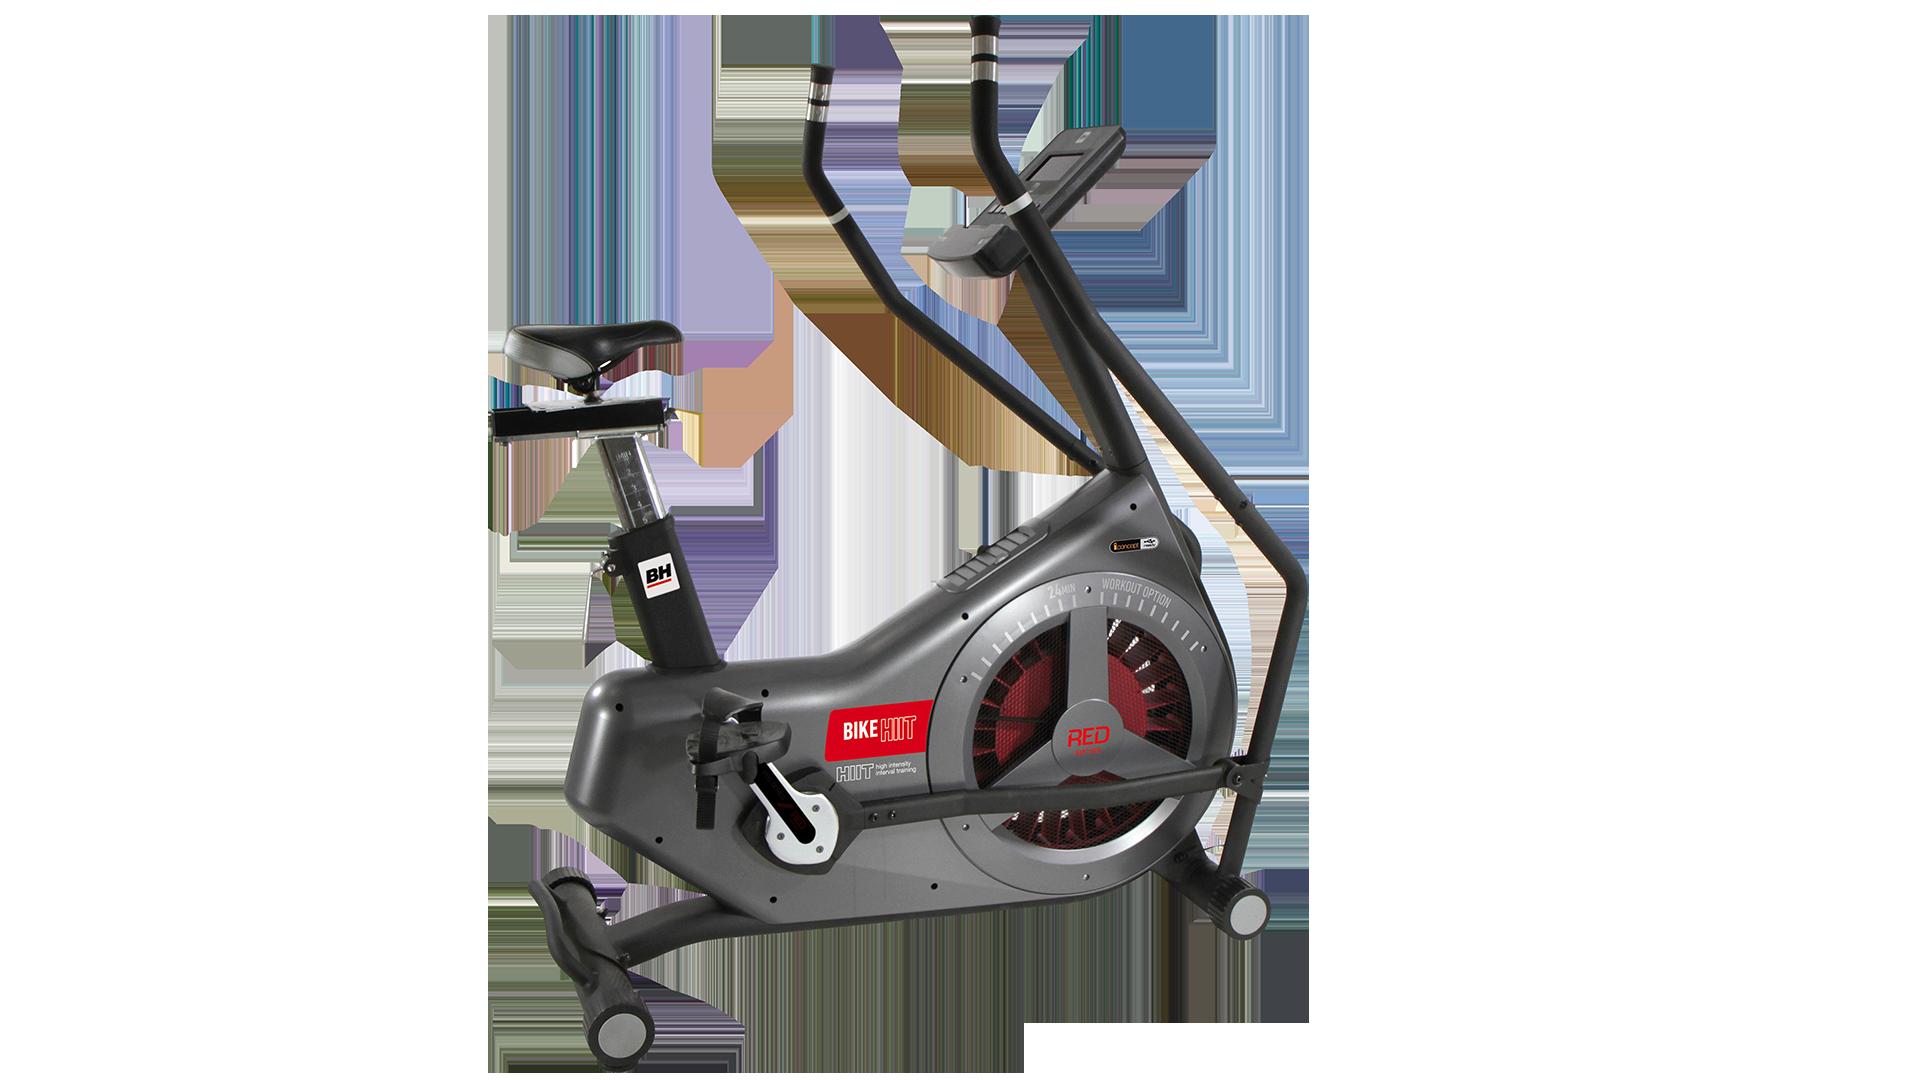 LK7850 Bicicleta vertical profesional